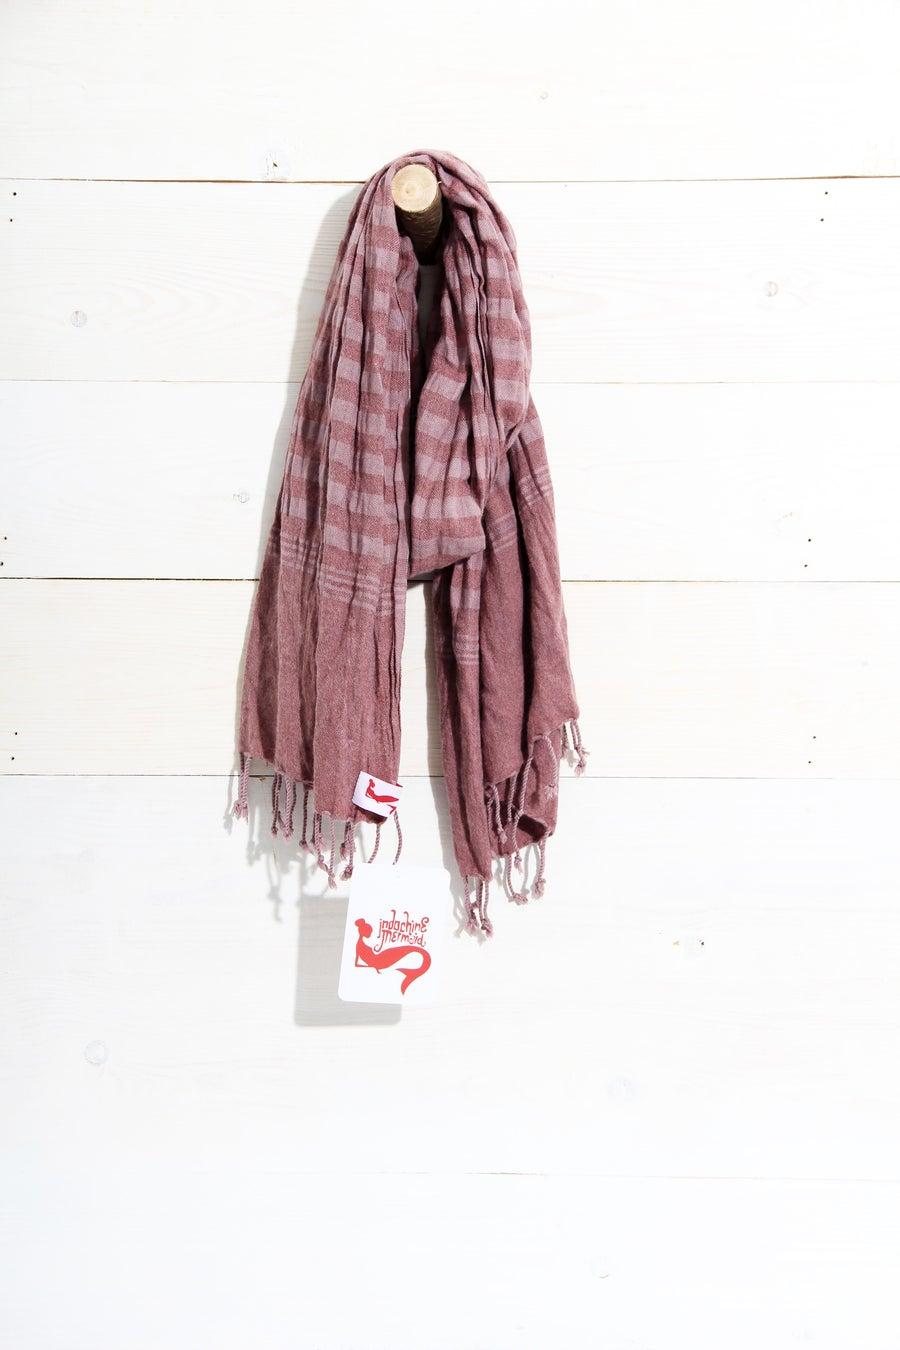 Image of schal au Baumwolle ∞ cotton scarf ∞ Altrosa